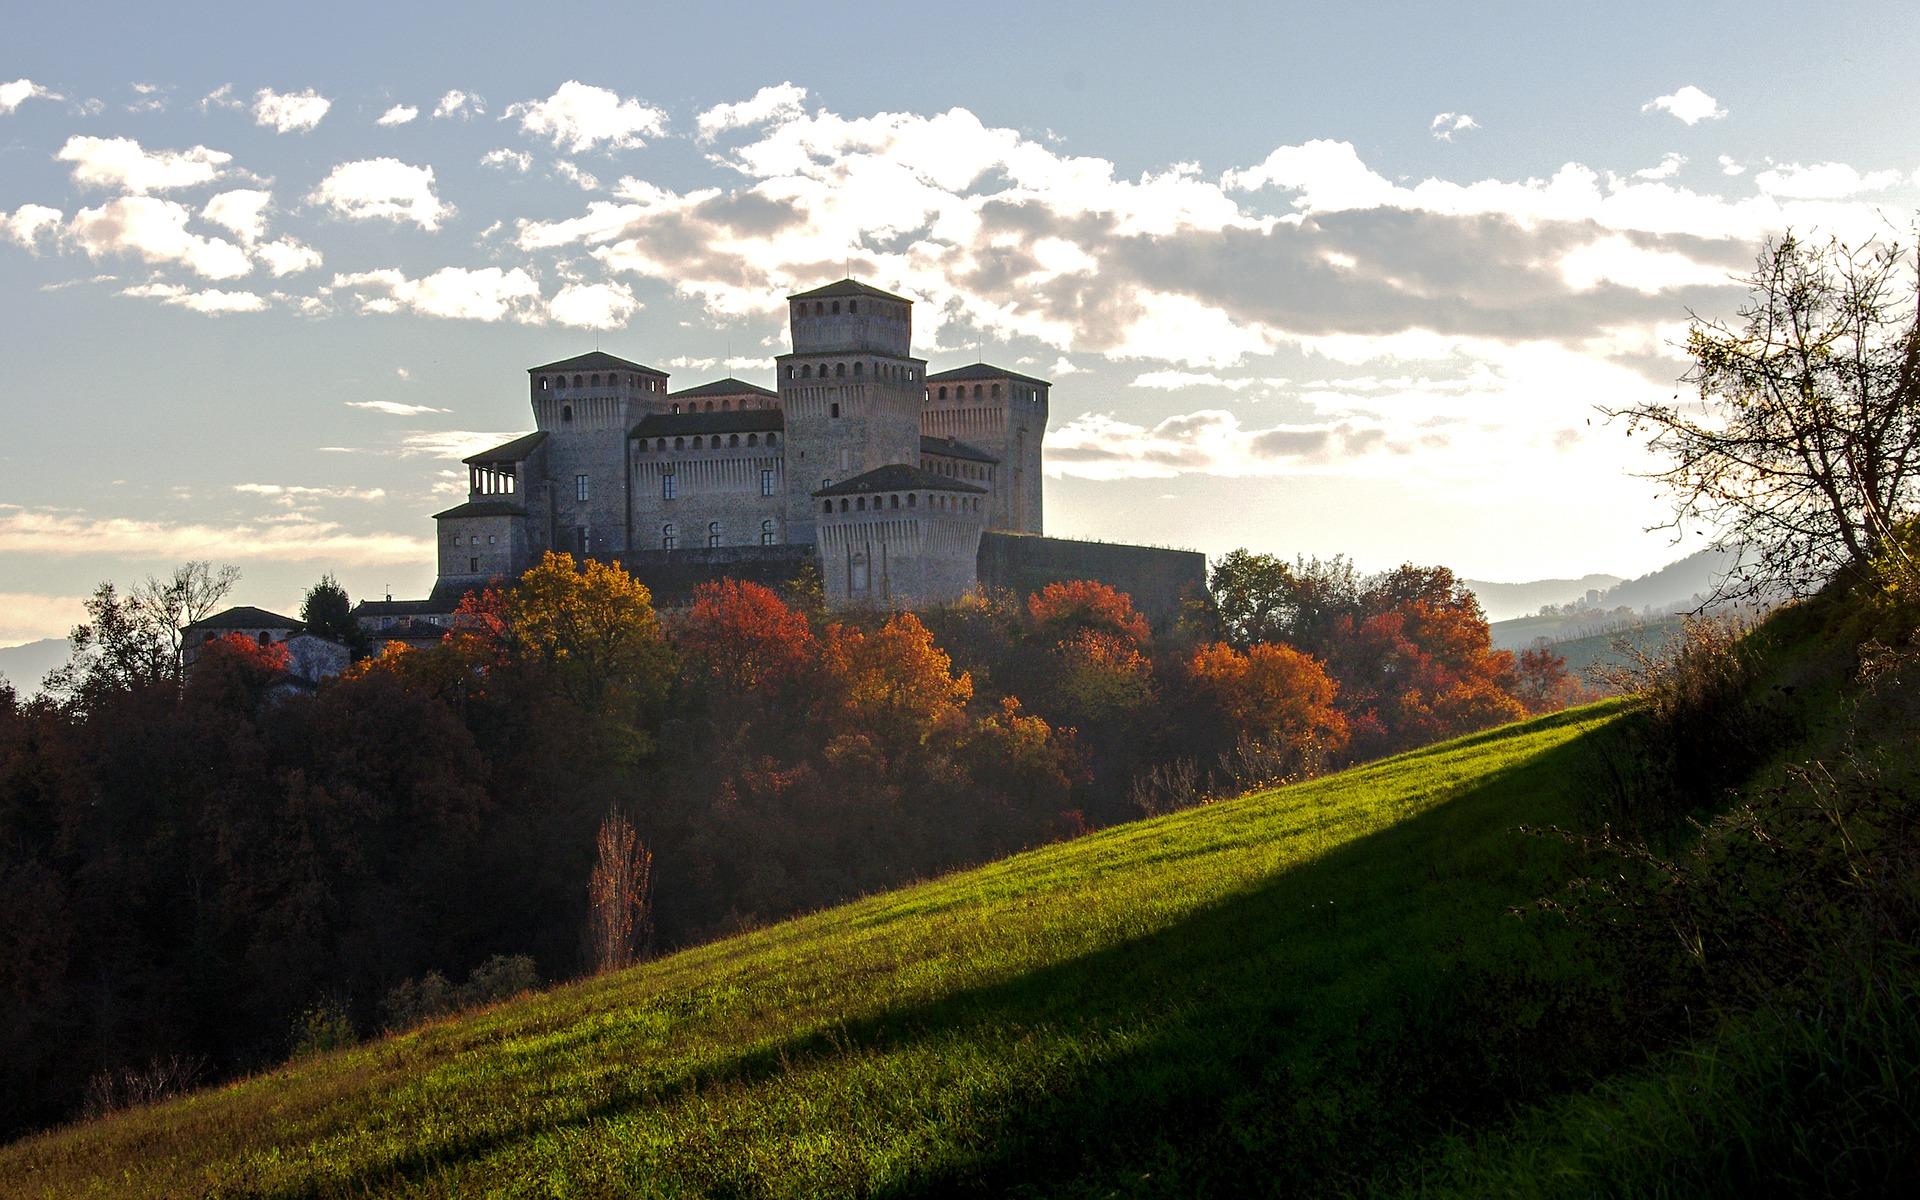 Alla scoperta dell'Emilia-Romagna: Torrechiara, Parma